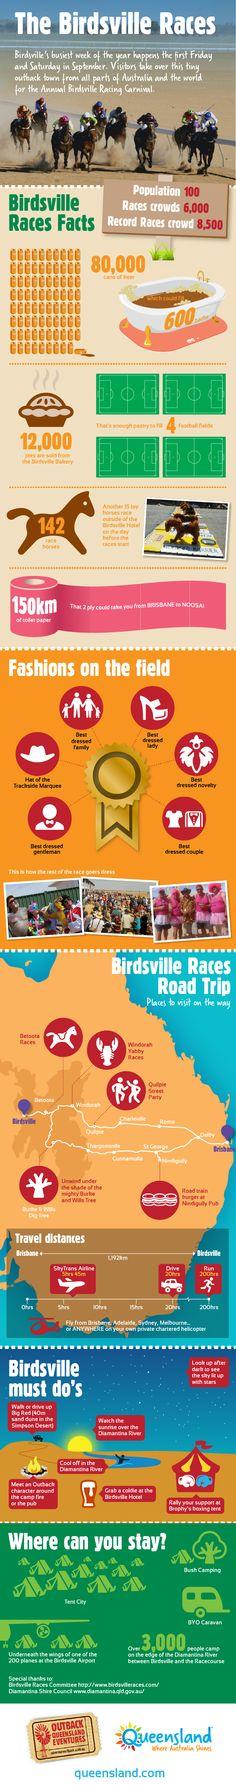 BUCKET LIST: Go to the Birdsville Races for my birthday. September.